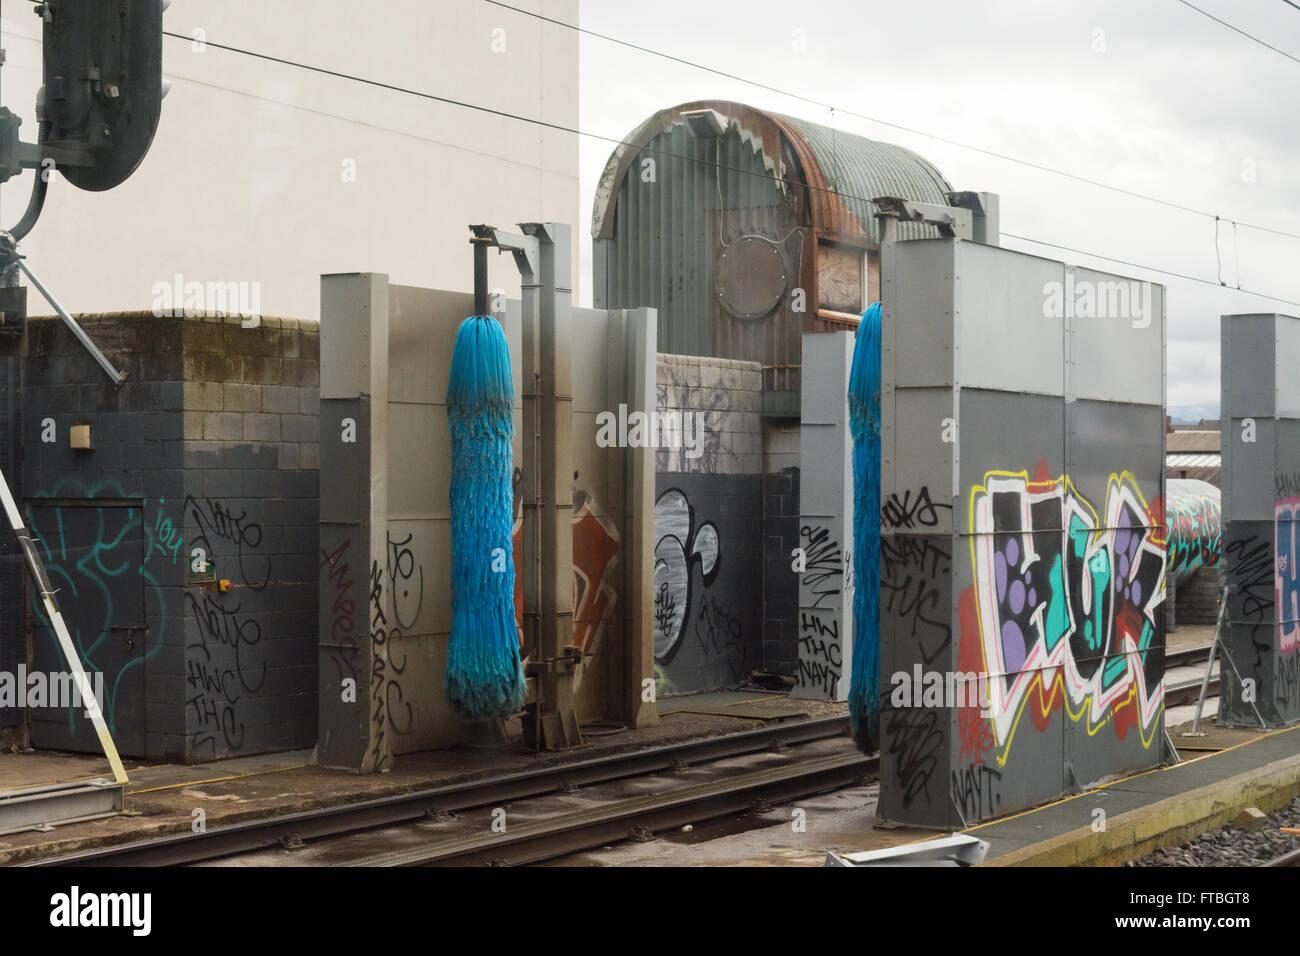 Train wash in siding outside Malahide, Dublin, Ireland - Stock Image